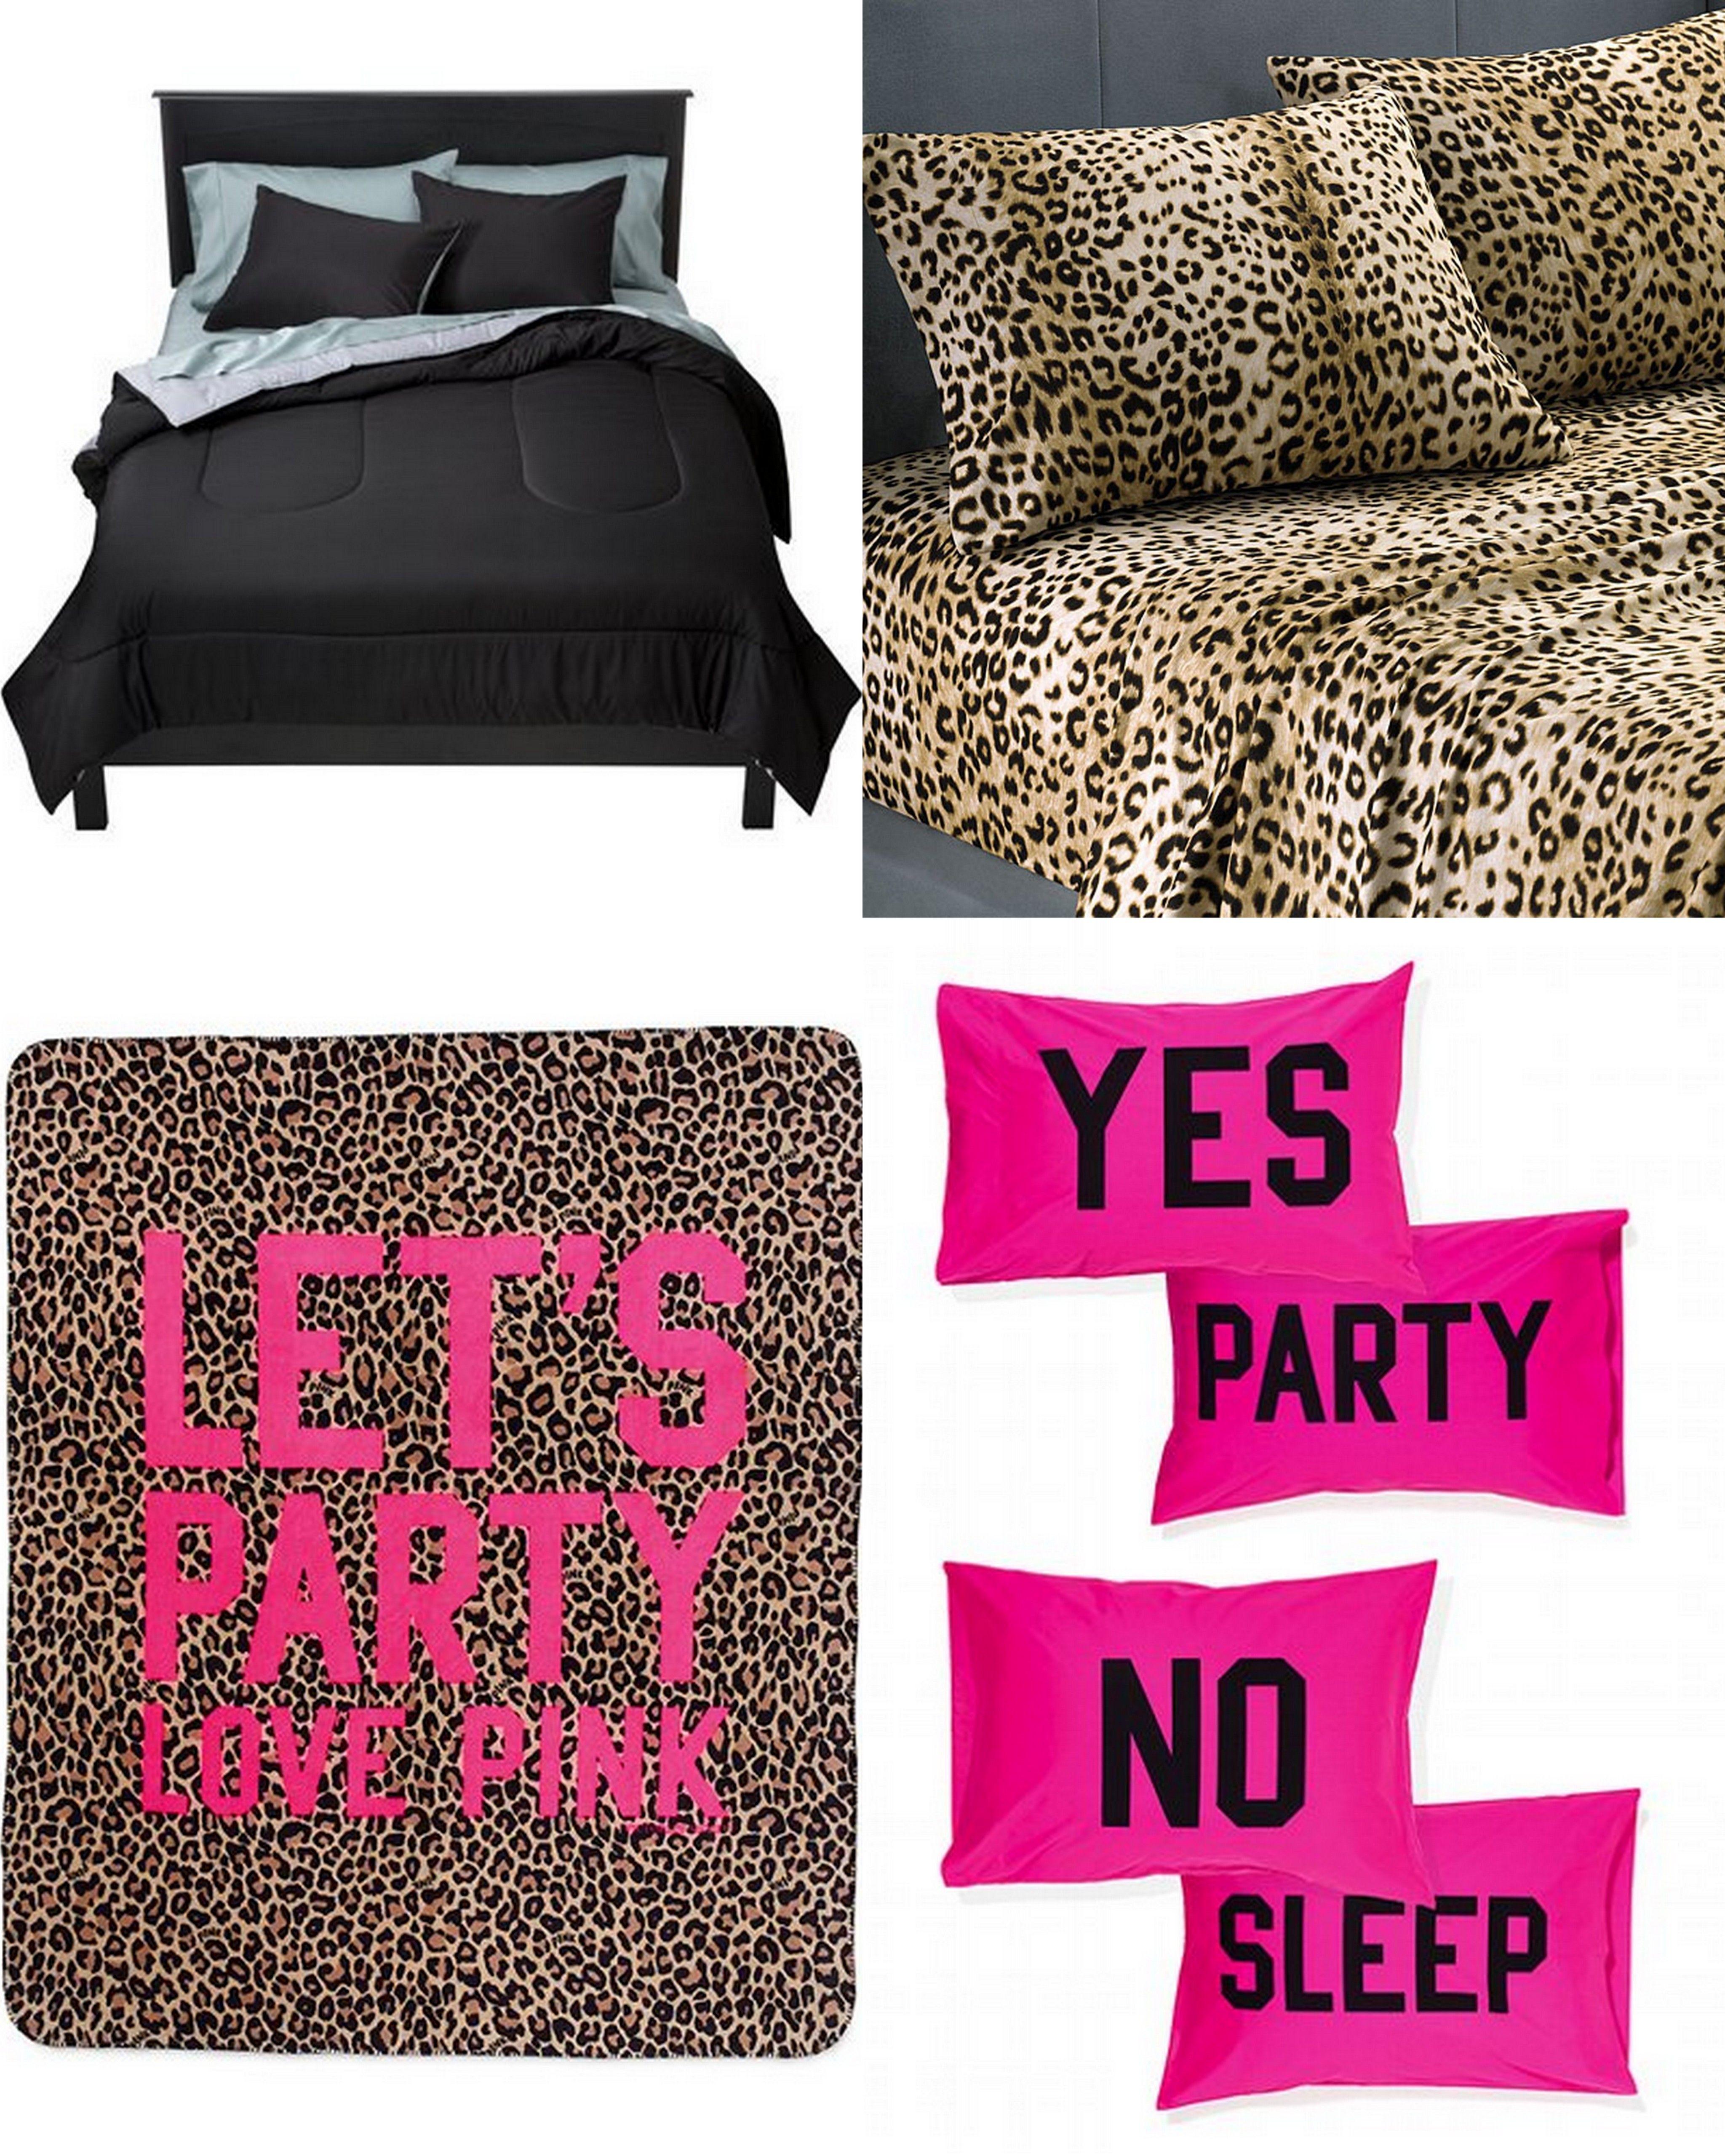 My Bed Set Target Plain Black Comforter Overstock.com Cheetah Sheets U0026  Pillowcases VS Pink